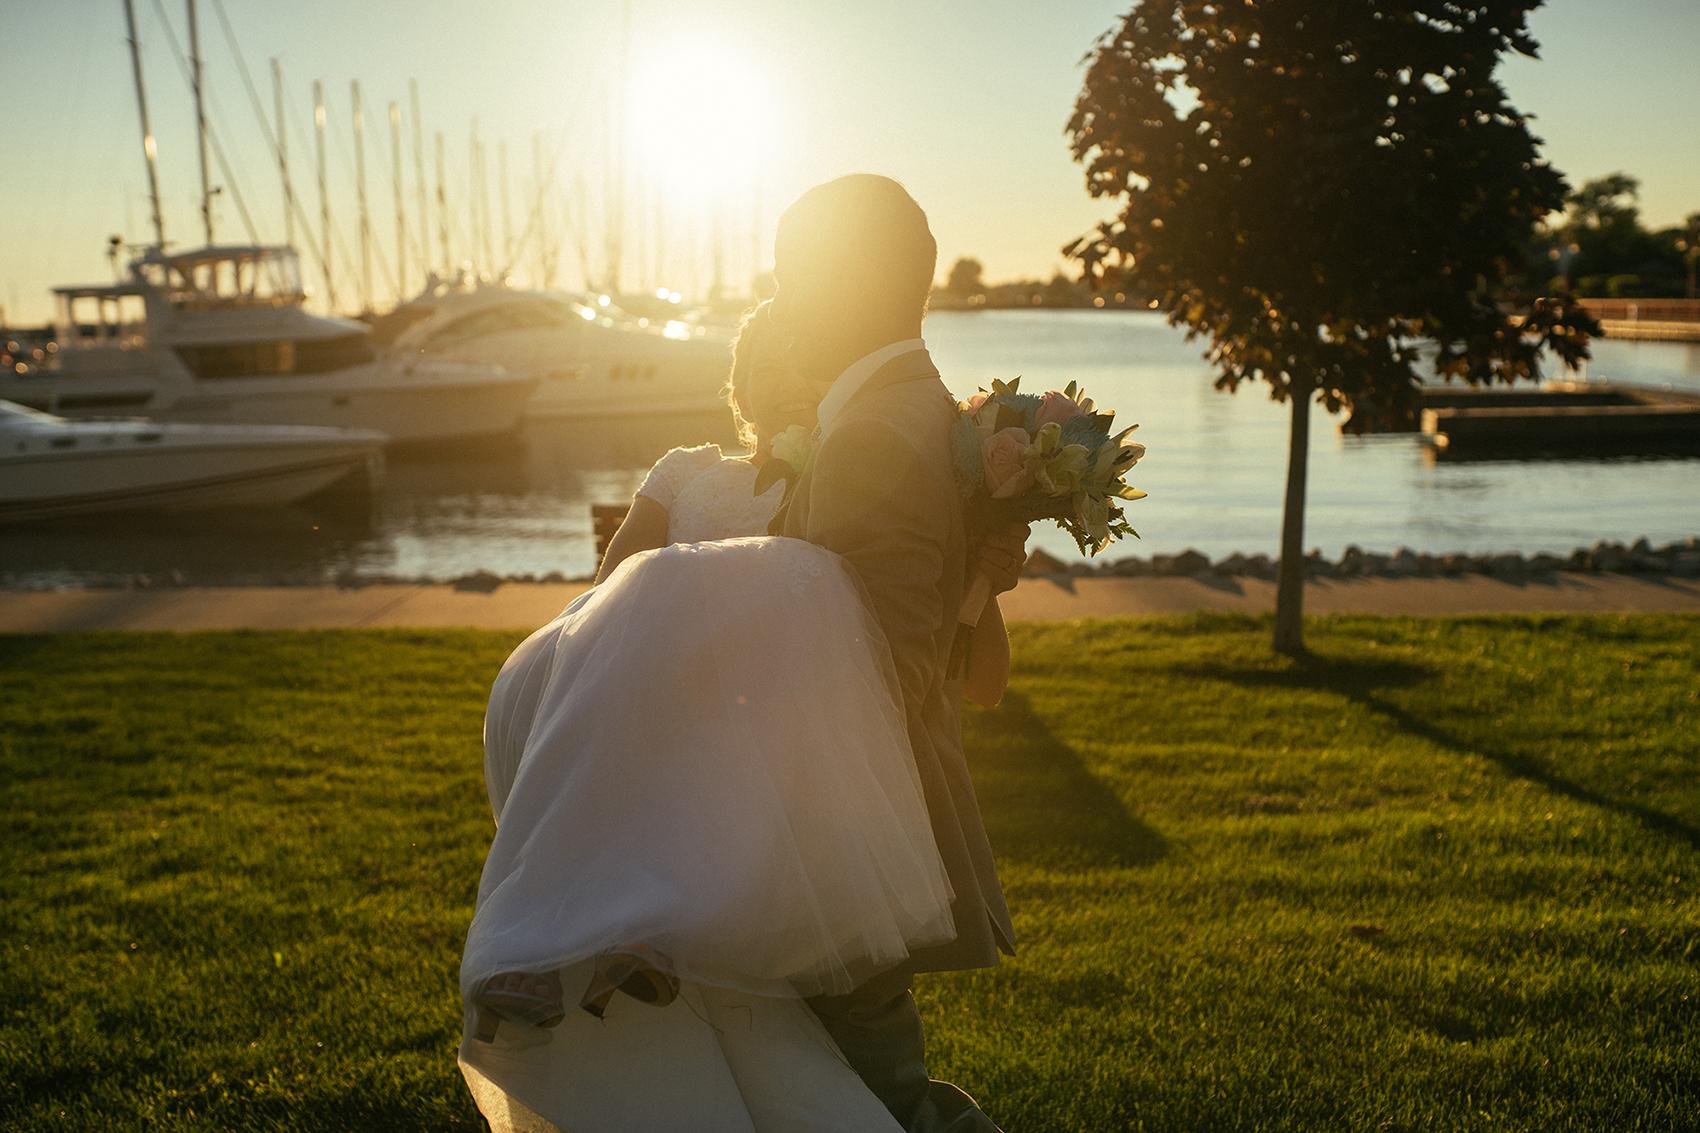 Mike_Mendez_Photography_Wedding_Engagements_8